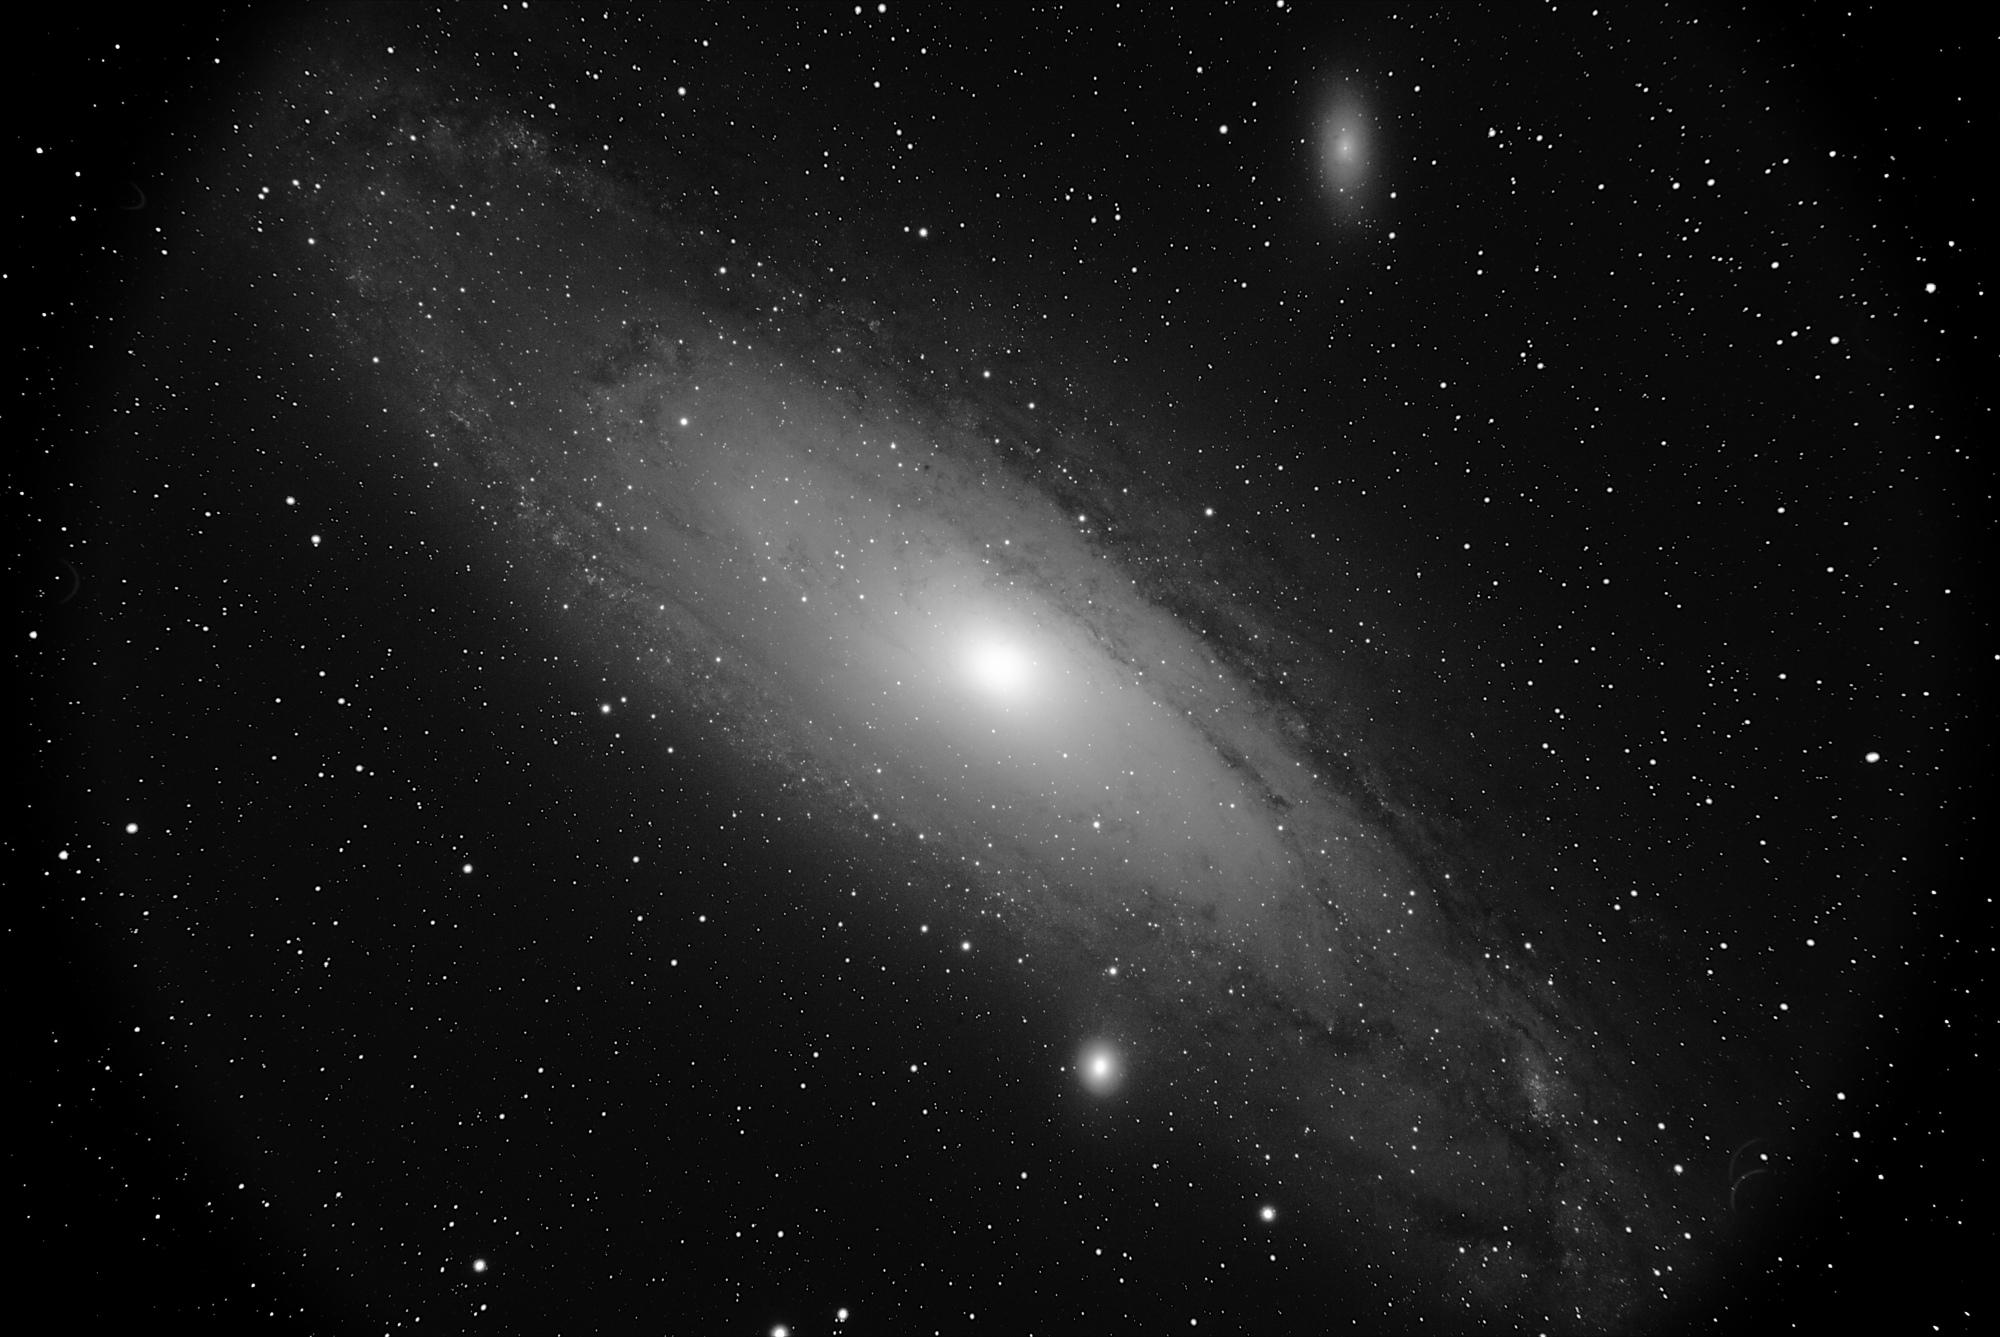 M31_1.thumb.jpg.f157844b7d32965fa1c0257b782c9793.jpg